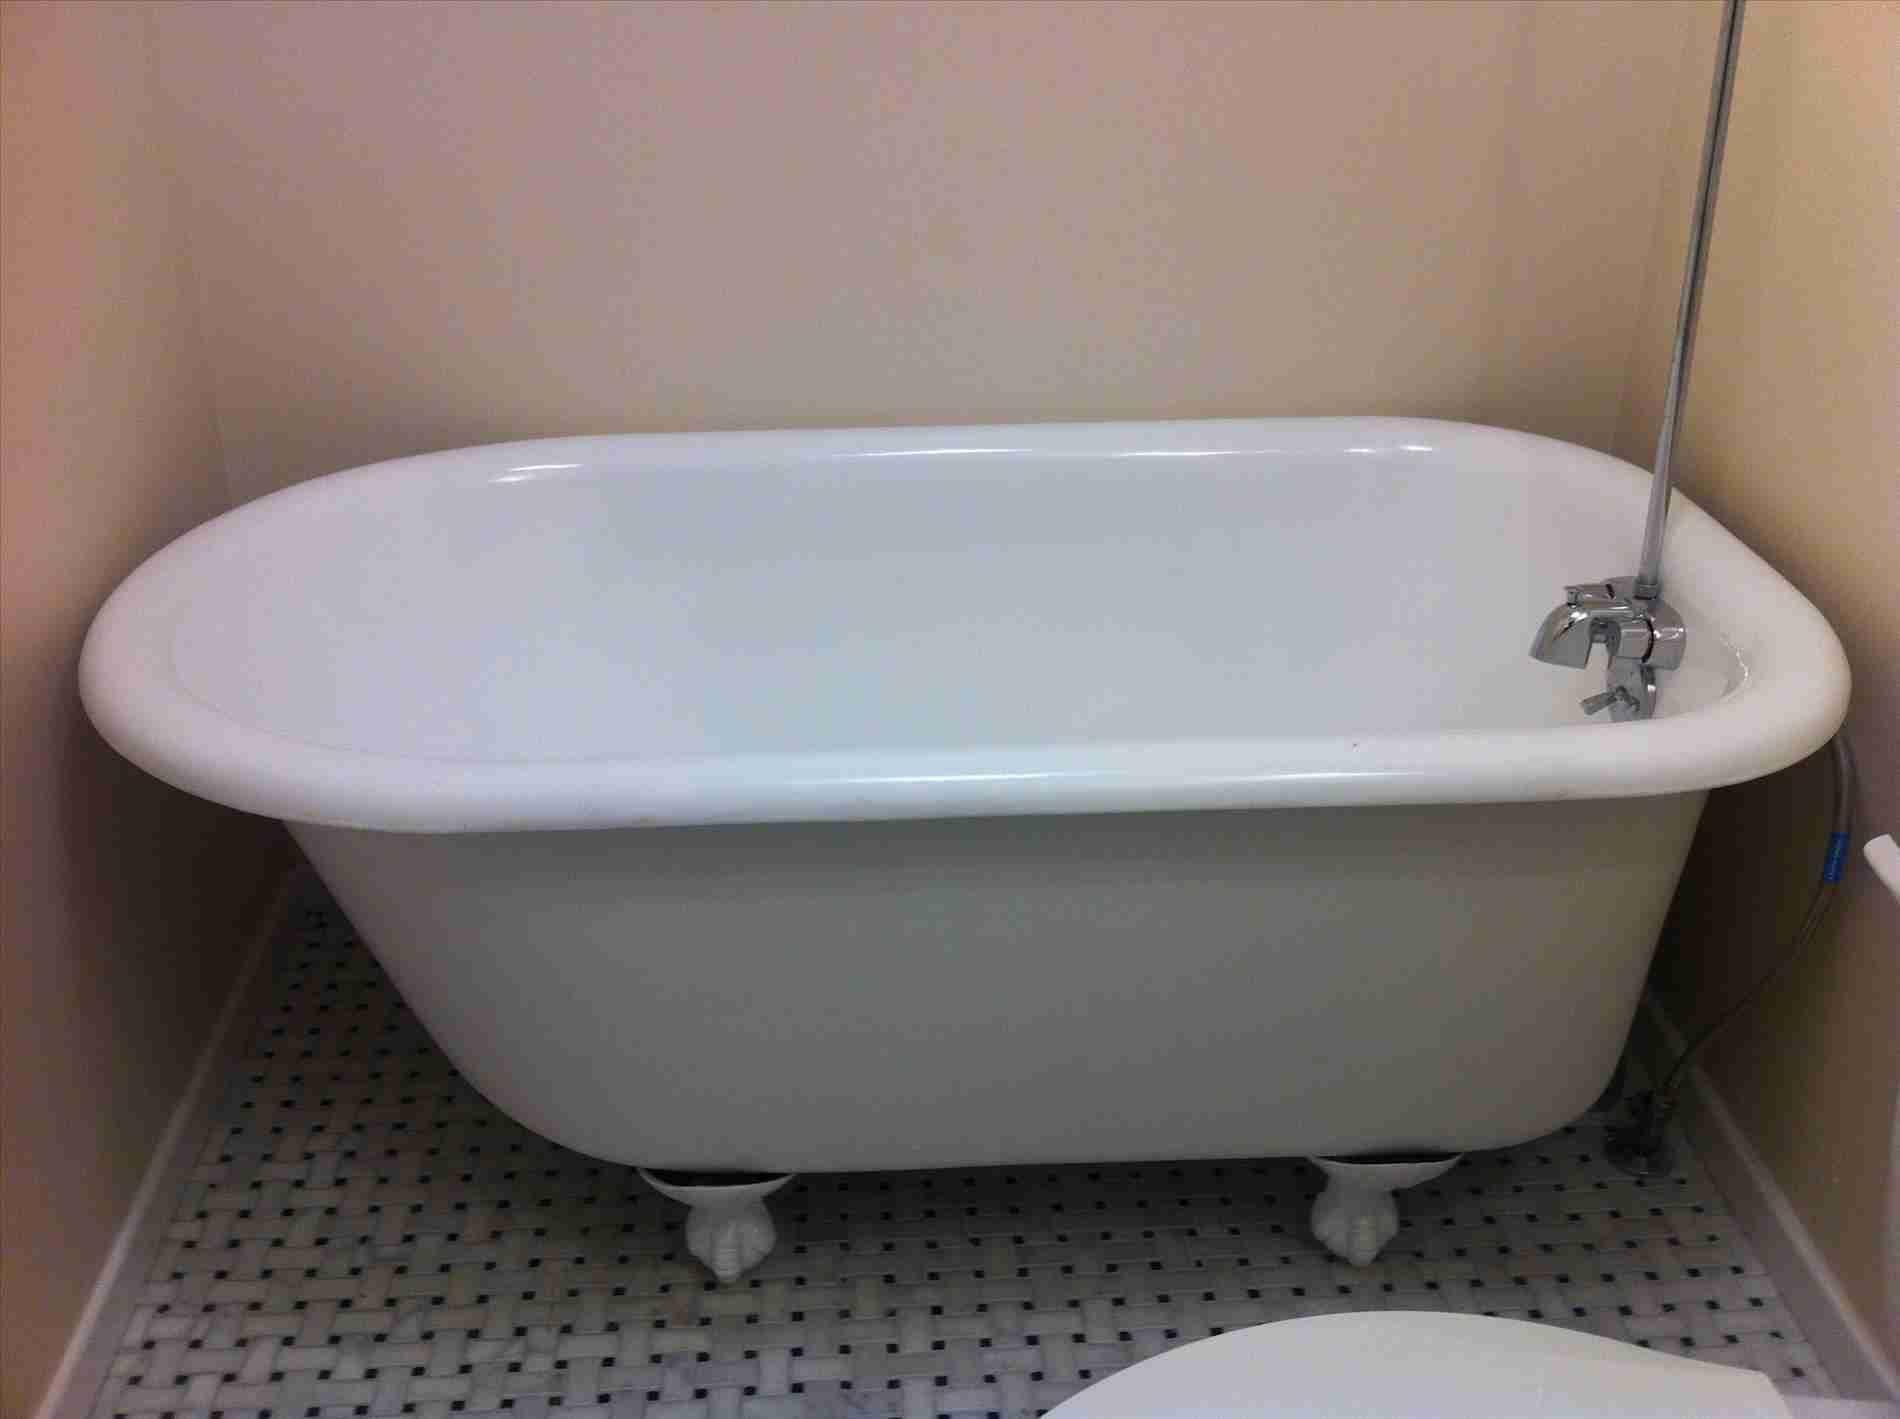 Fine Clawfoot Tub Restoration Inspiration - Bathtub Ideas - dilata.info